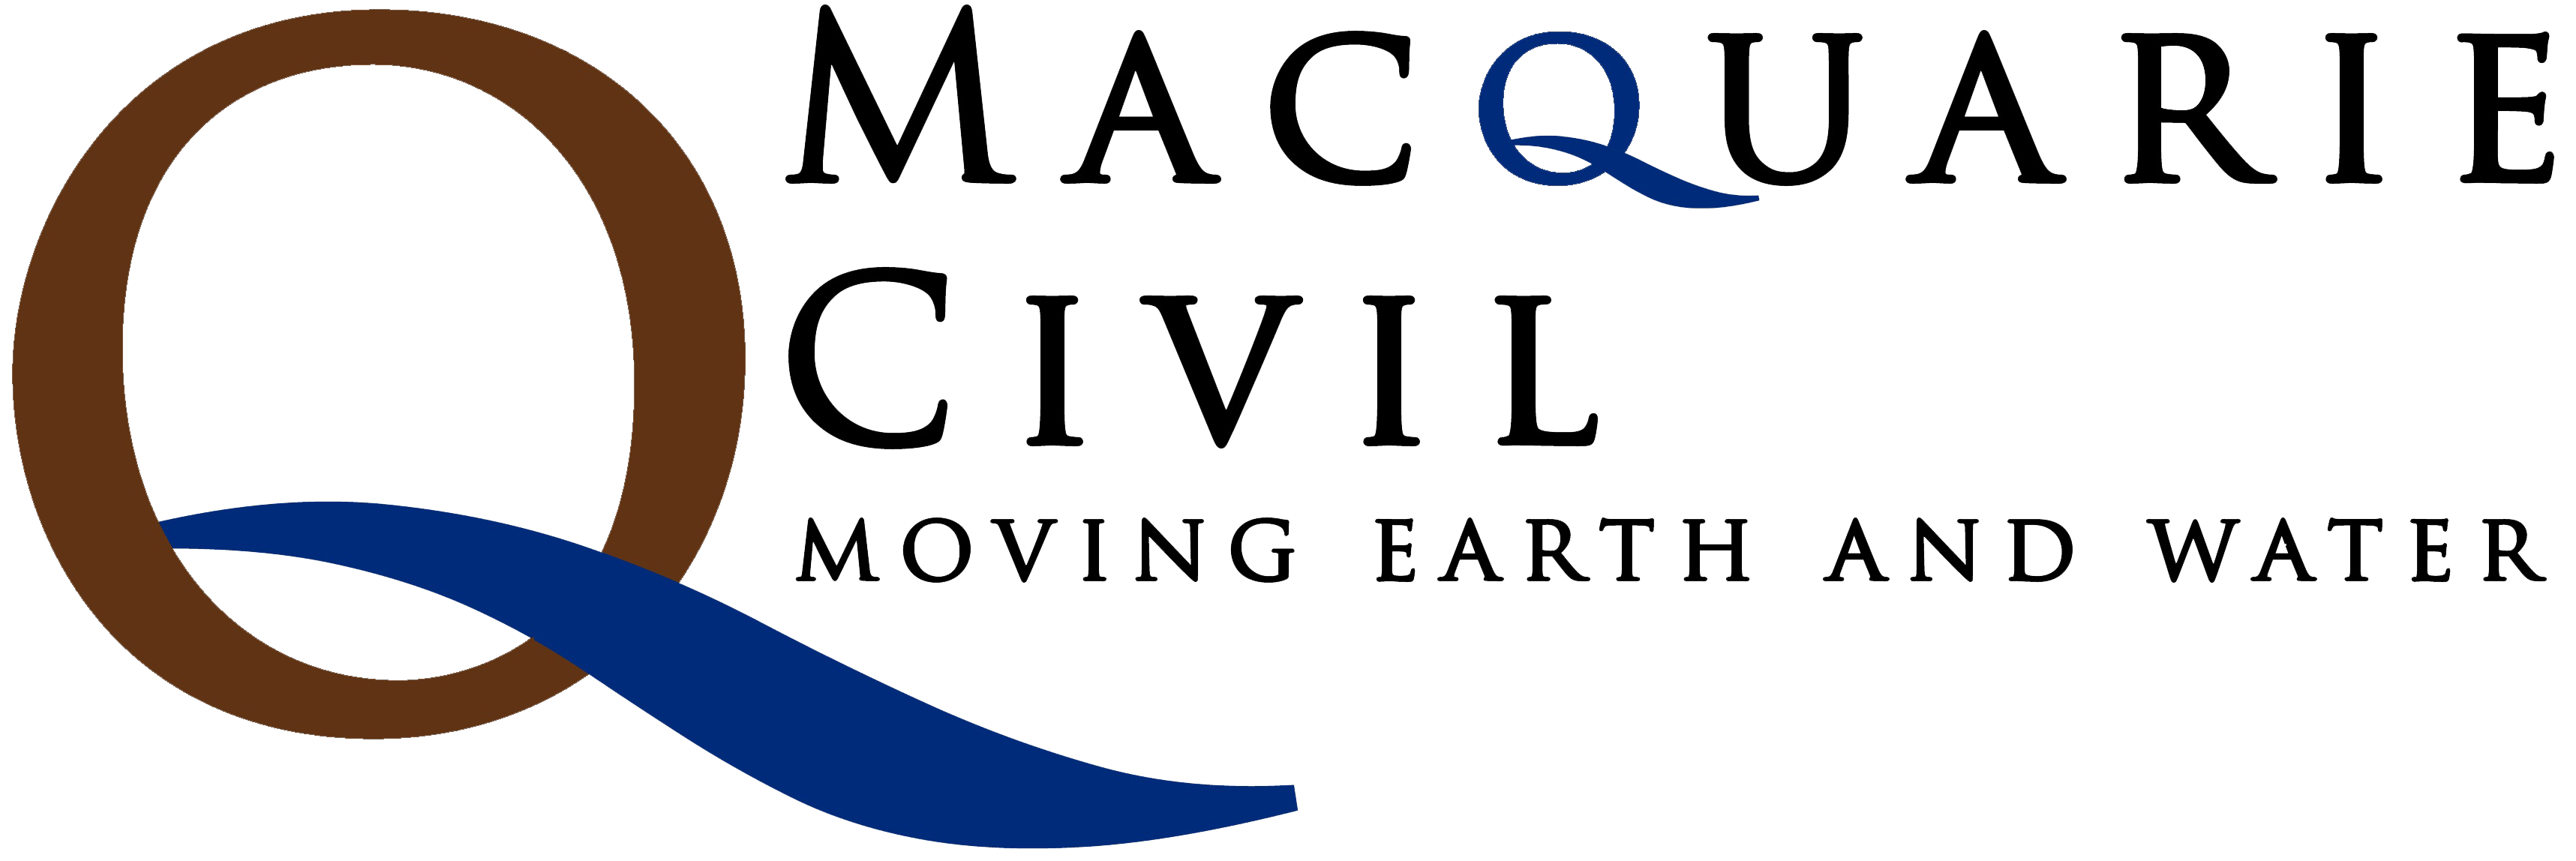 Macquarie civil logo